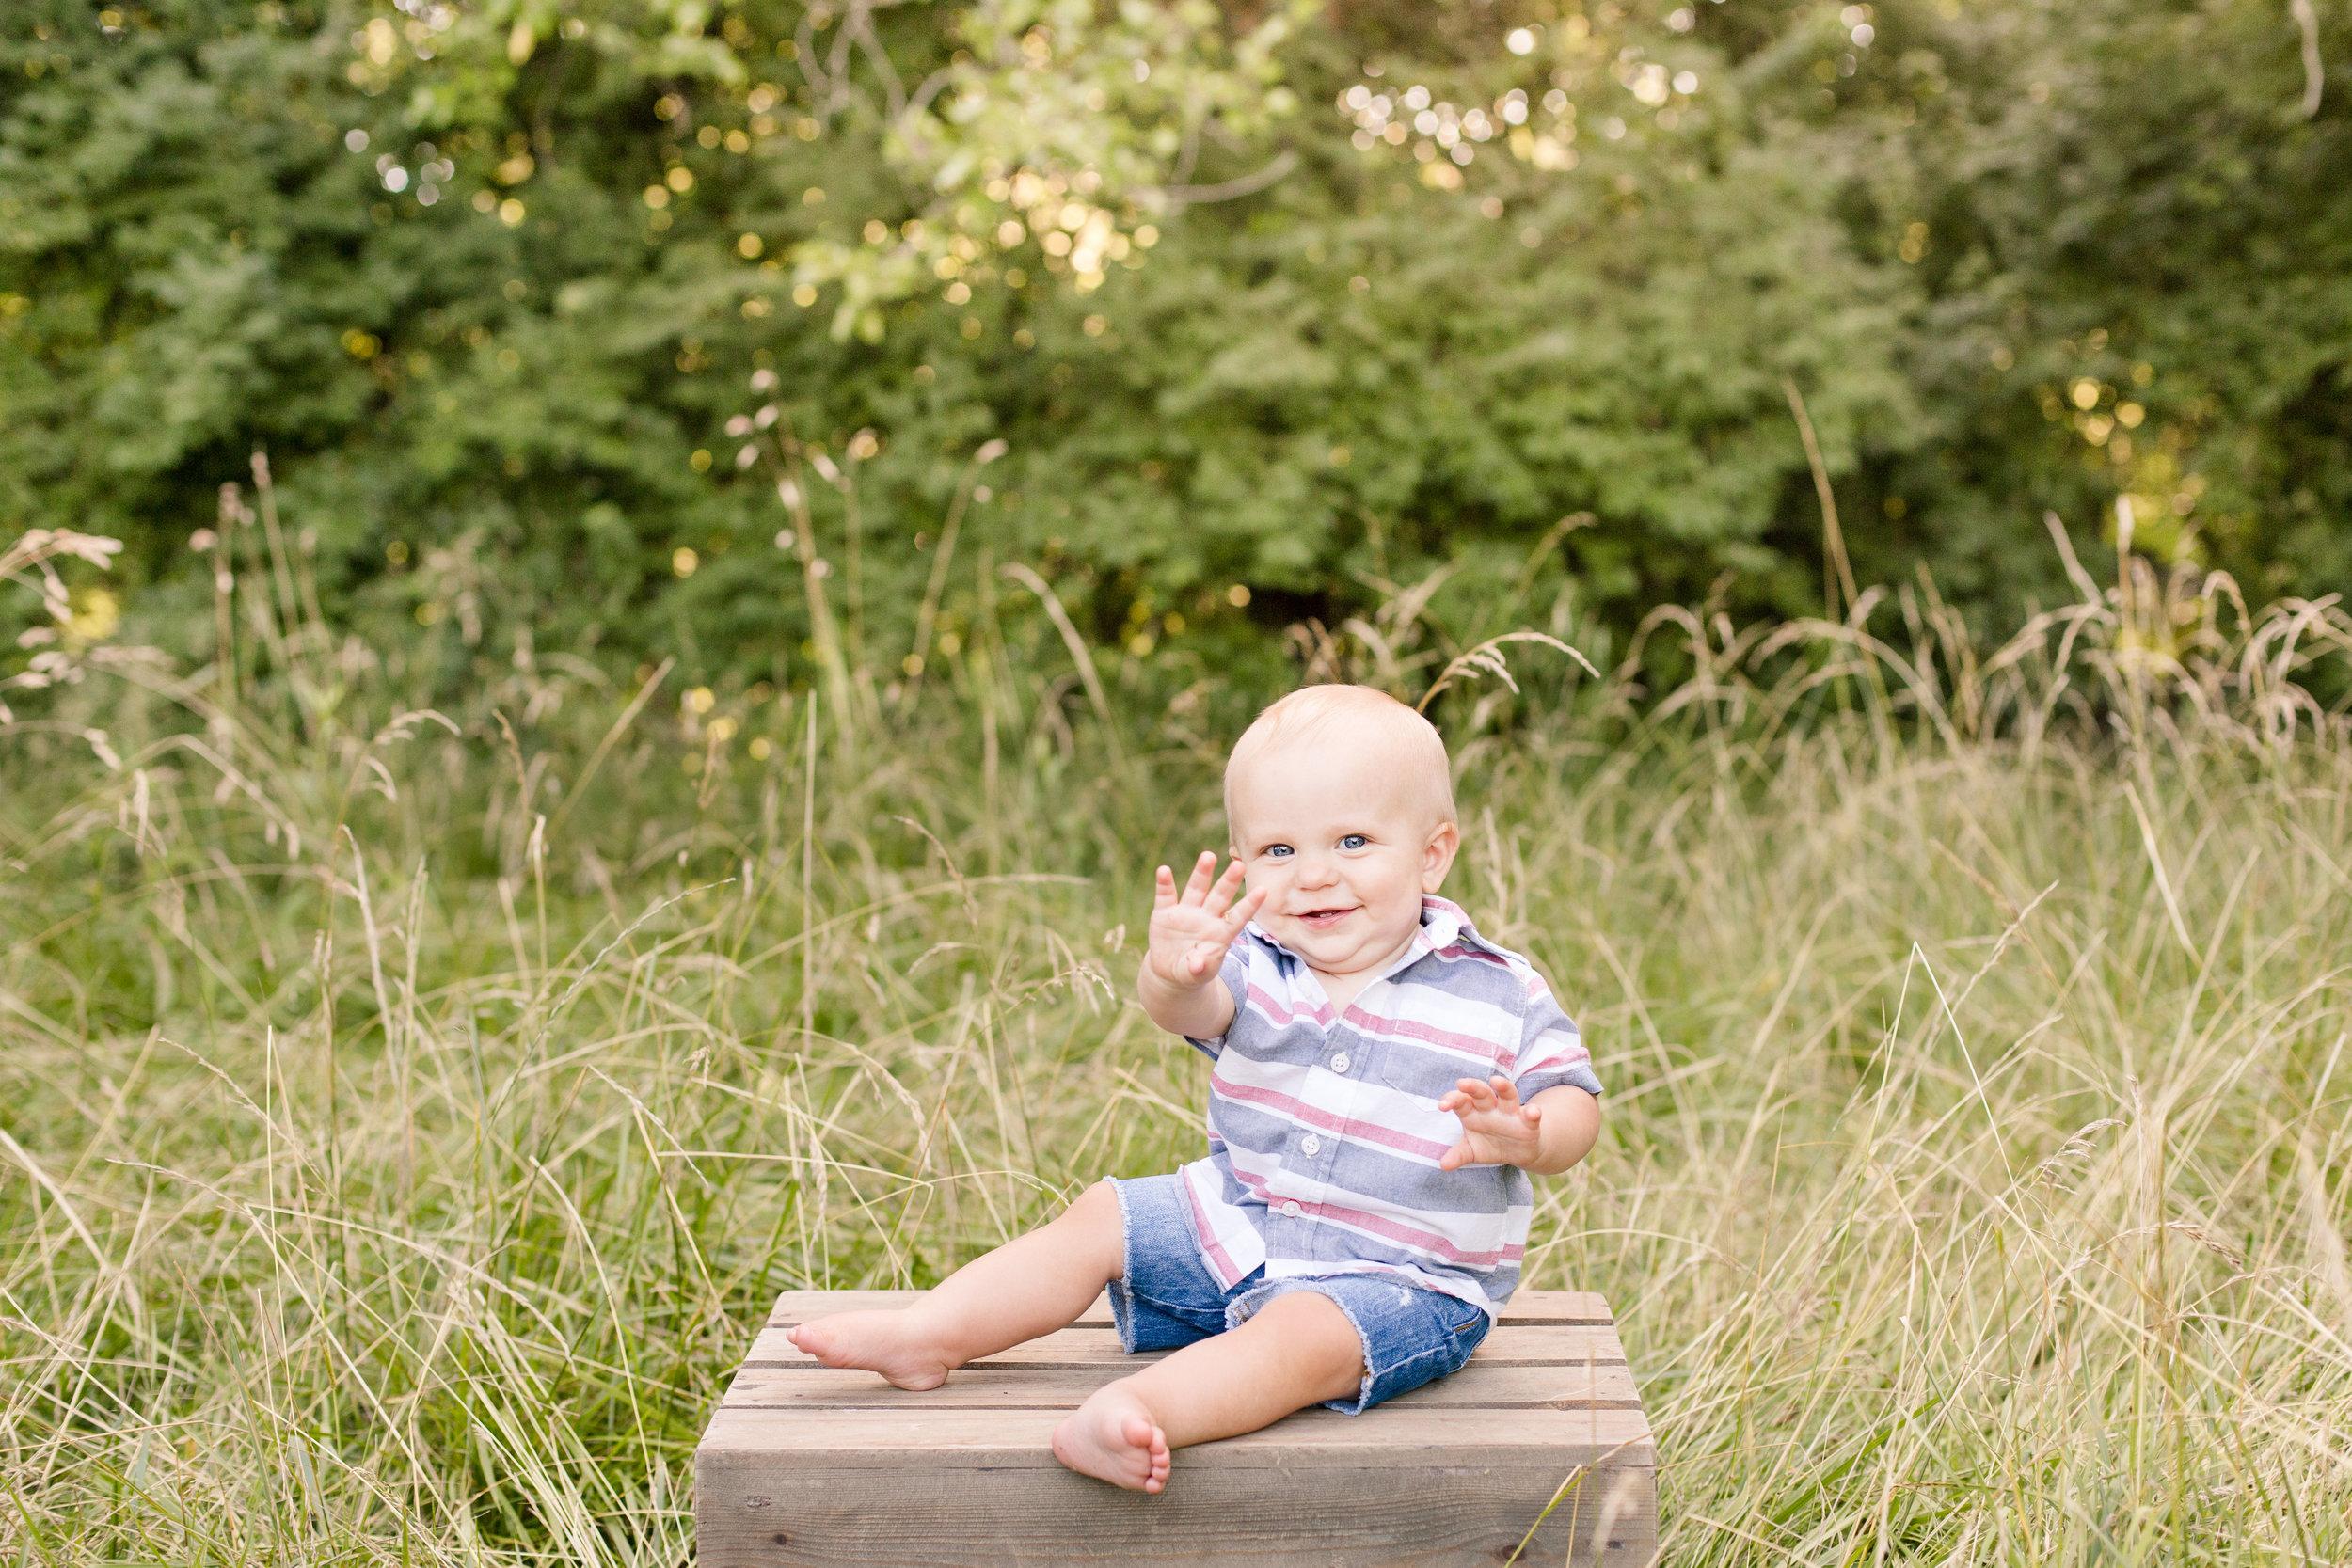 baby-photo-session-columbus-ohio-sarah-cropper-photography.jpg